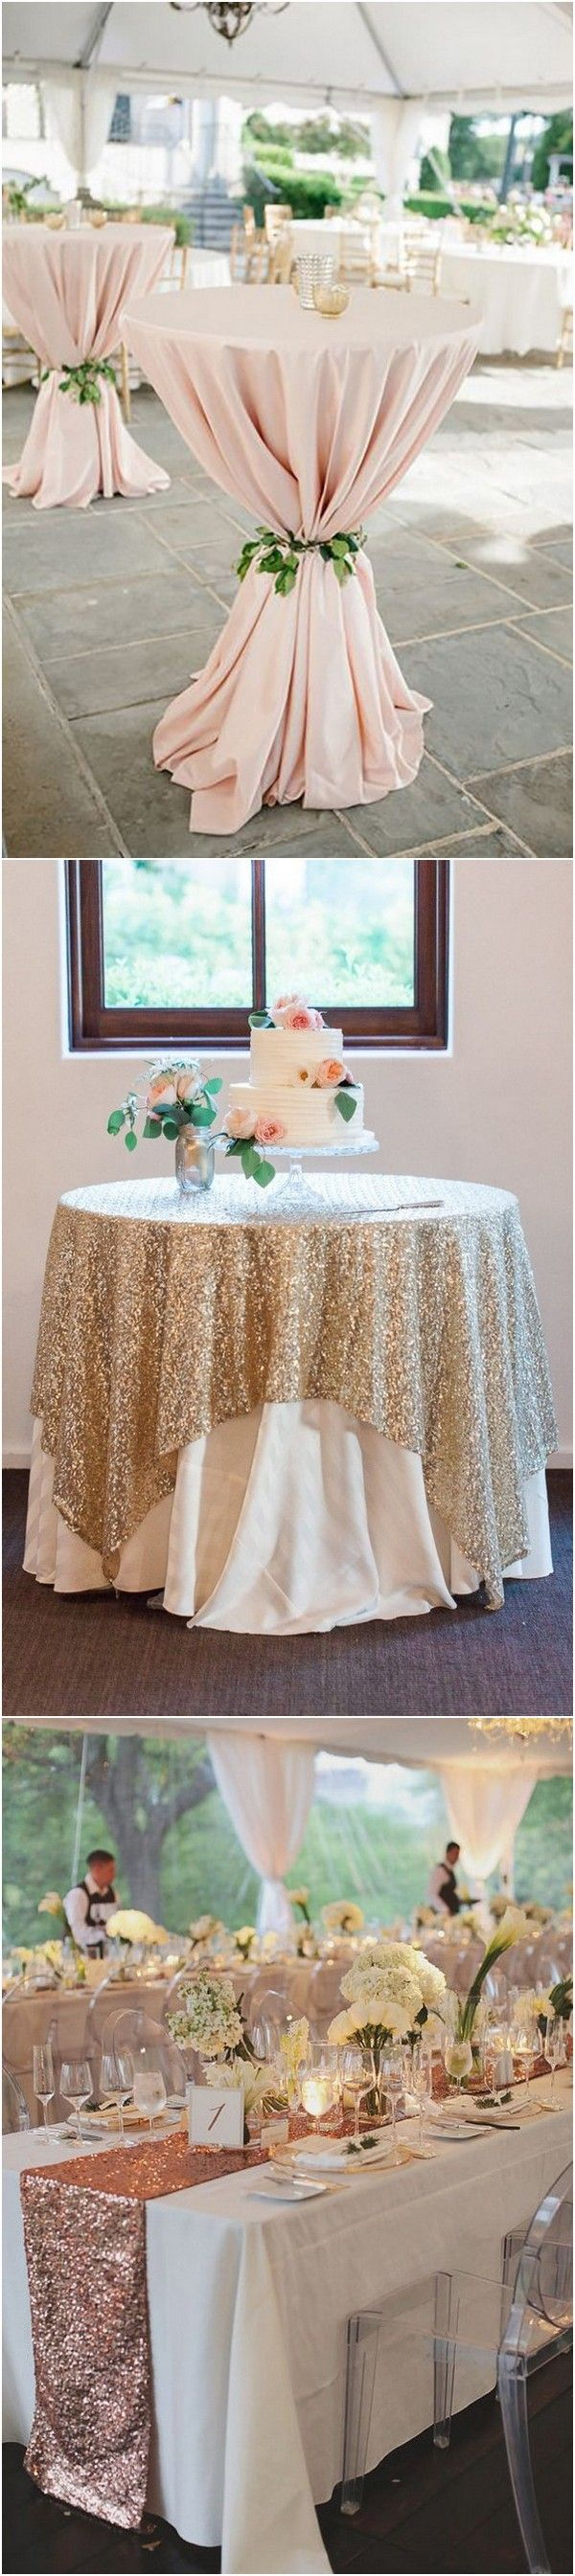 20 Brilliant Wedding Table Decoration Ideas